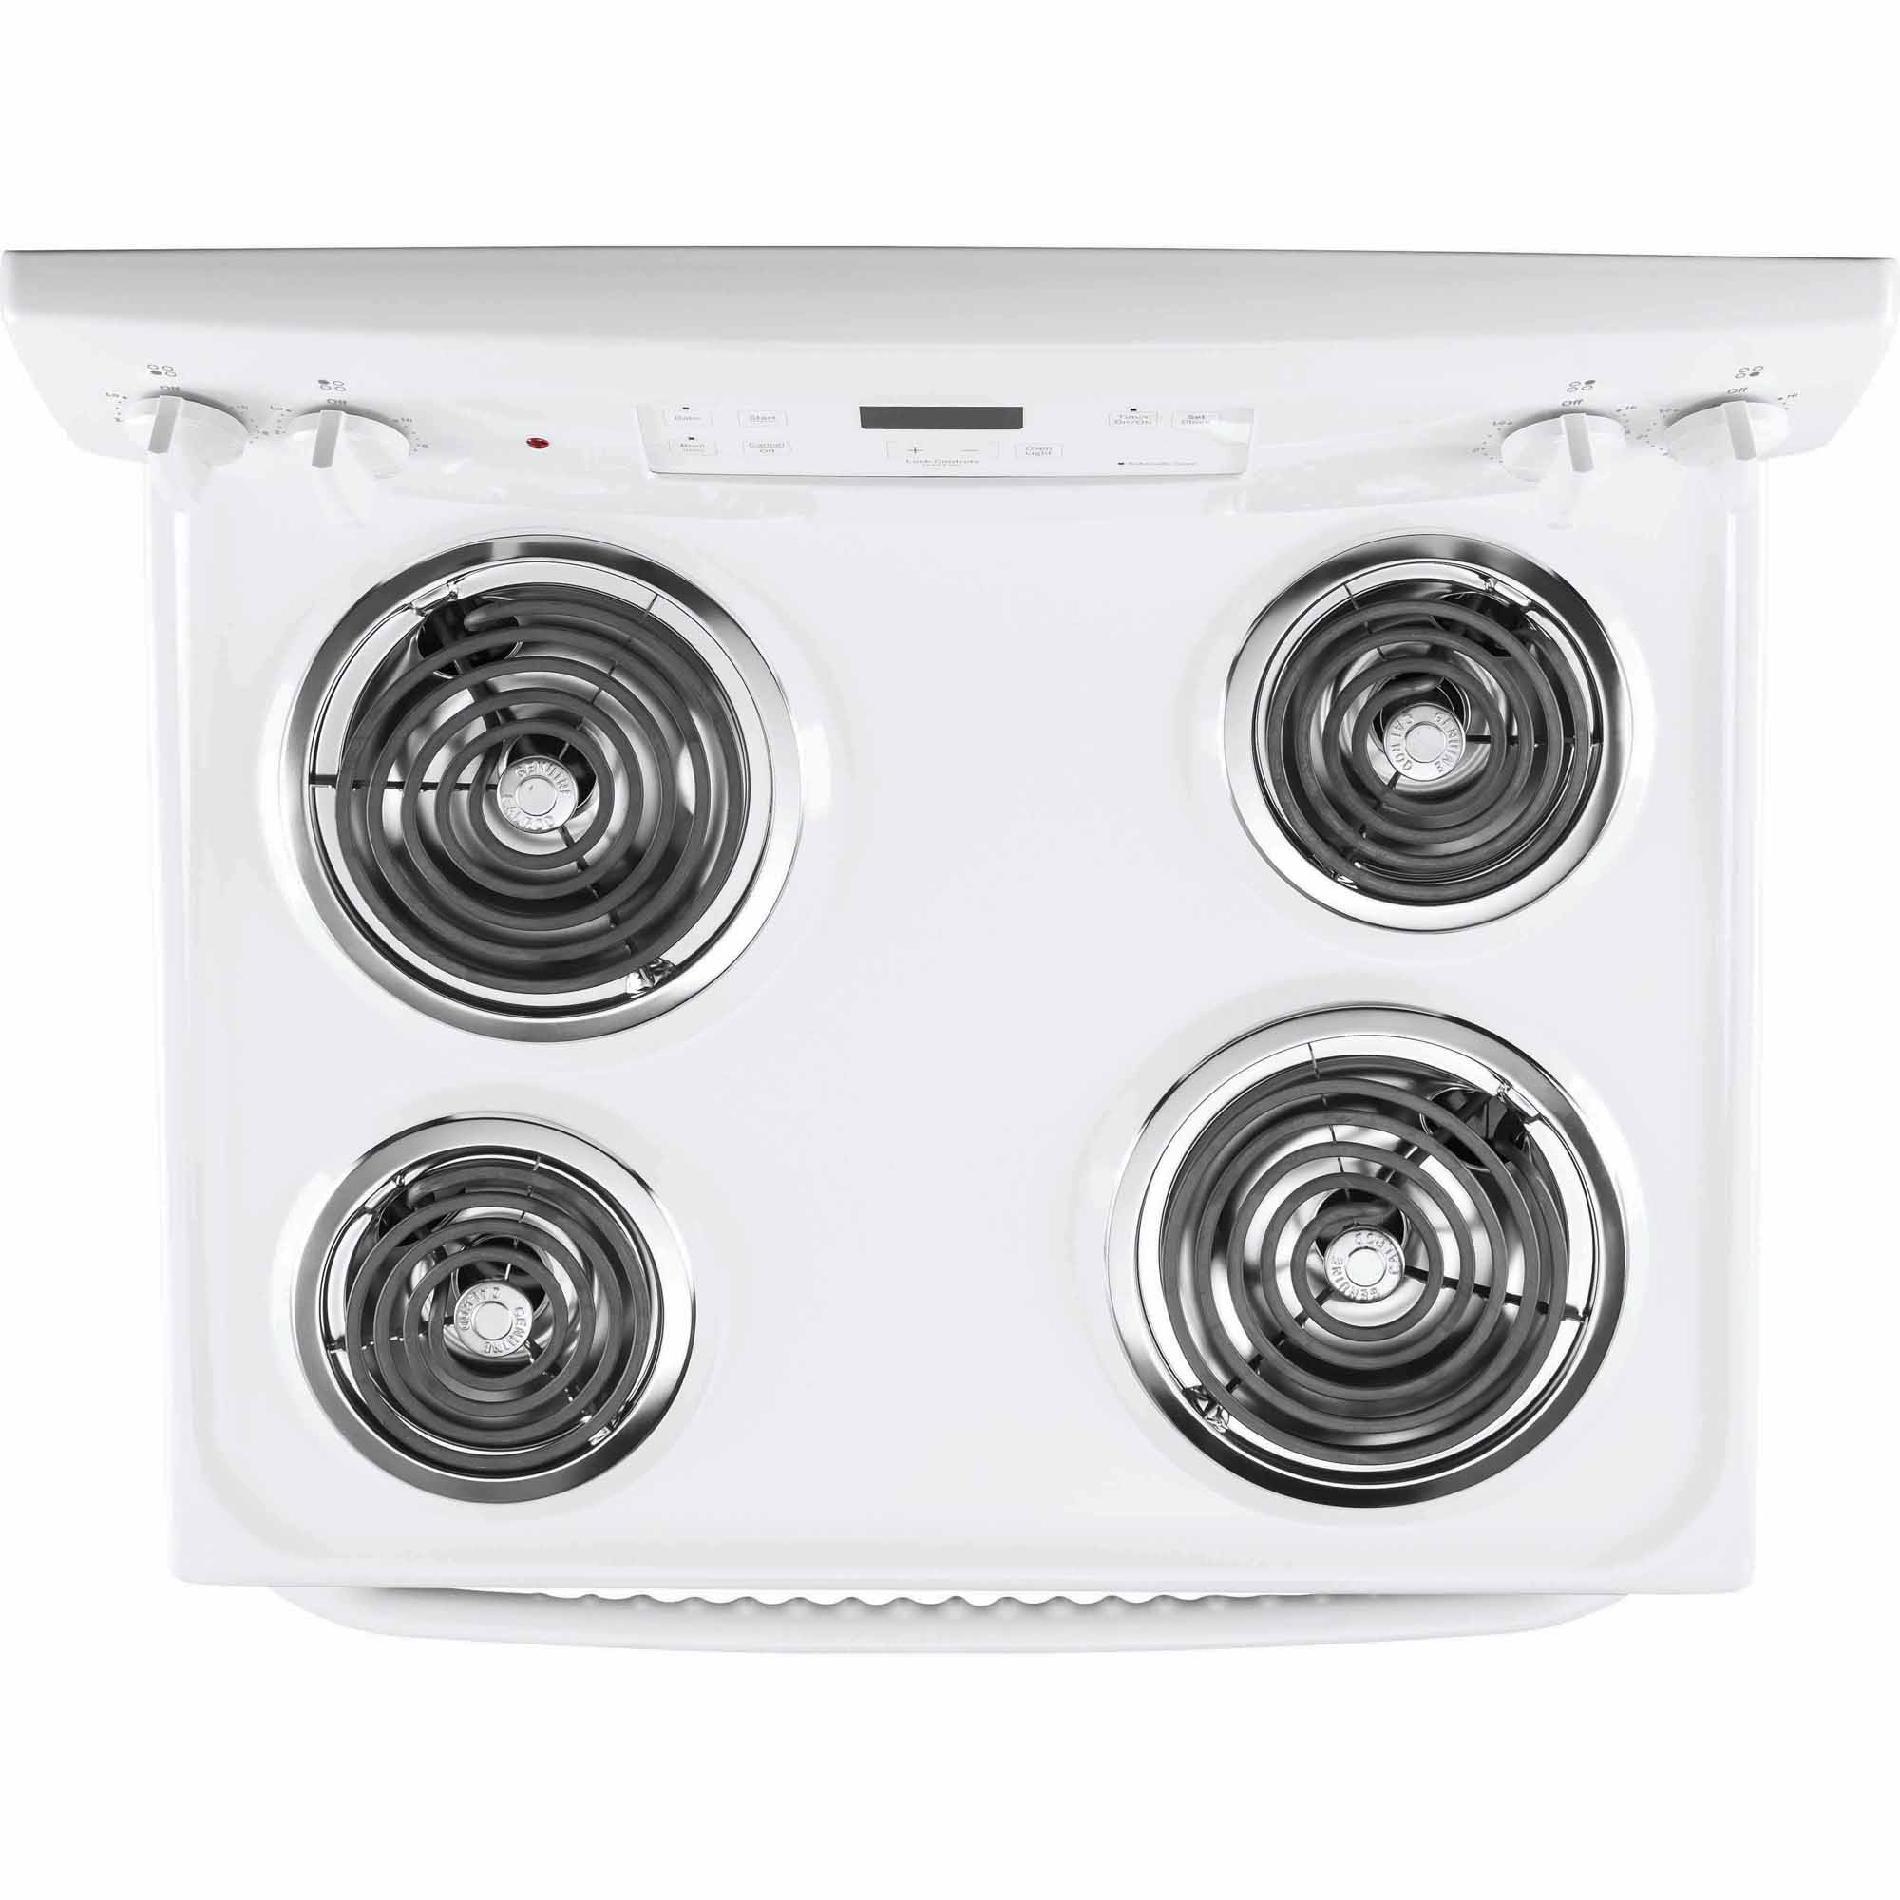 GE Appliances JBS27DFWW 5.0 cu. ft. Electric Range - White